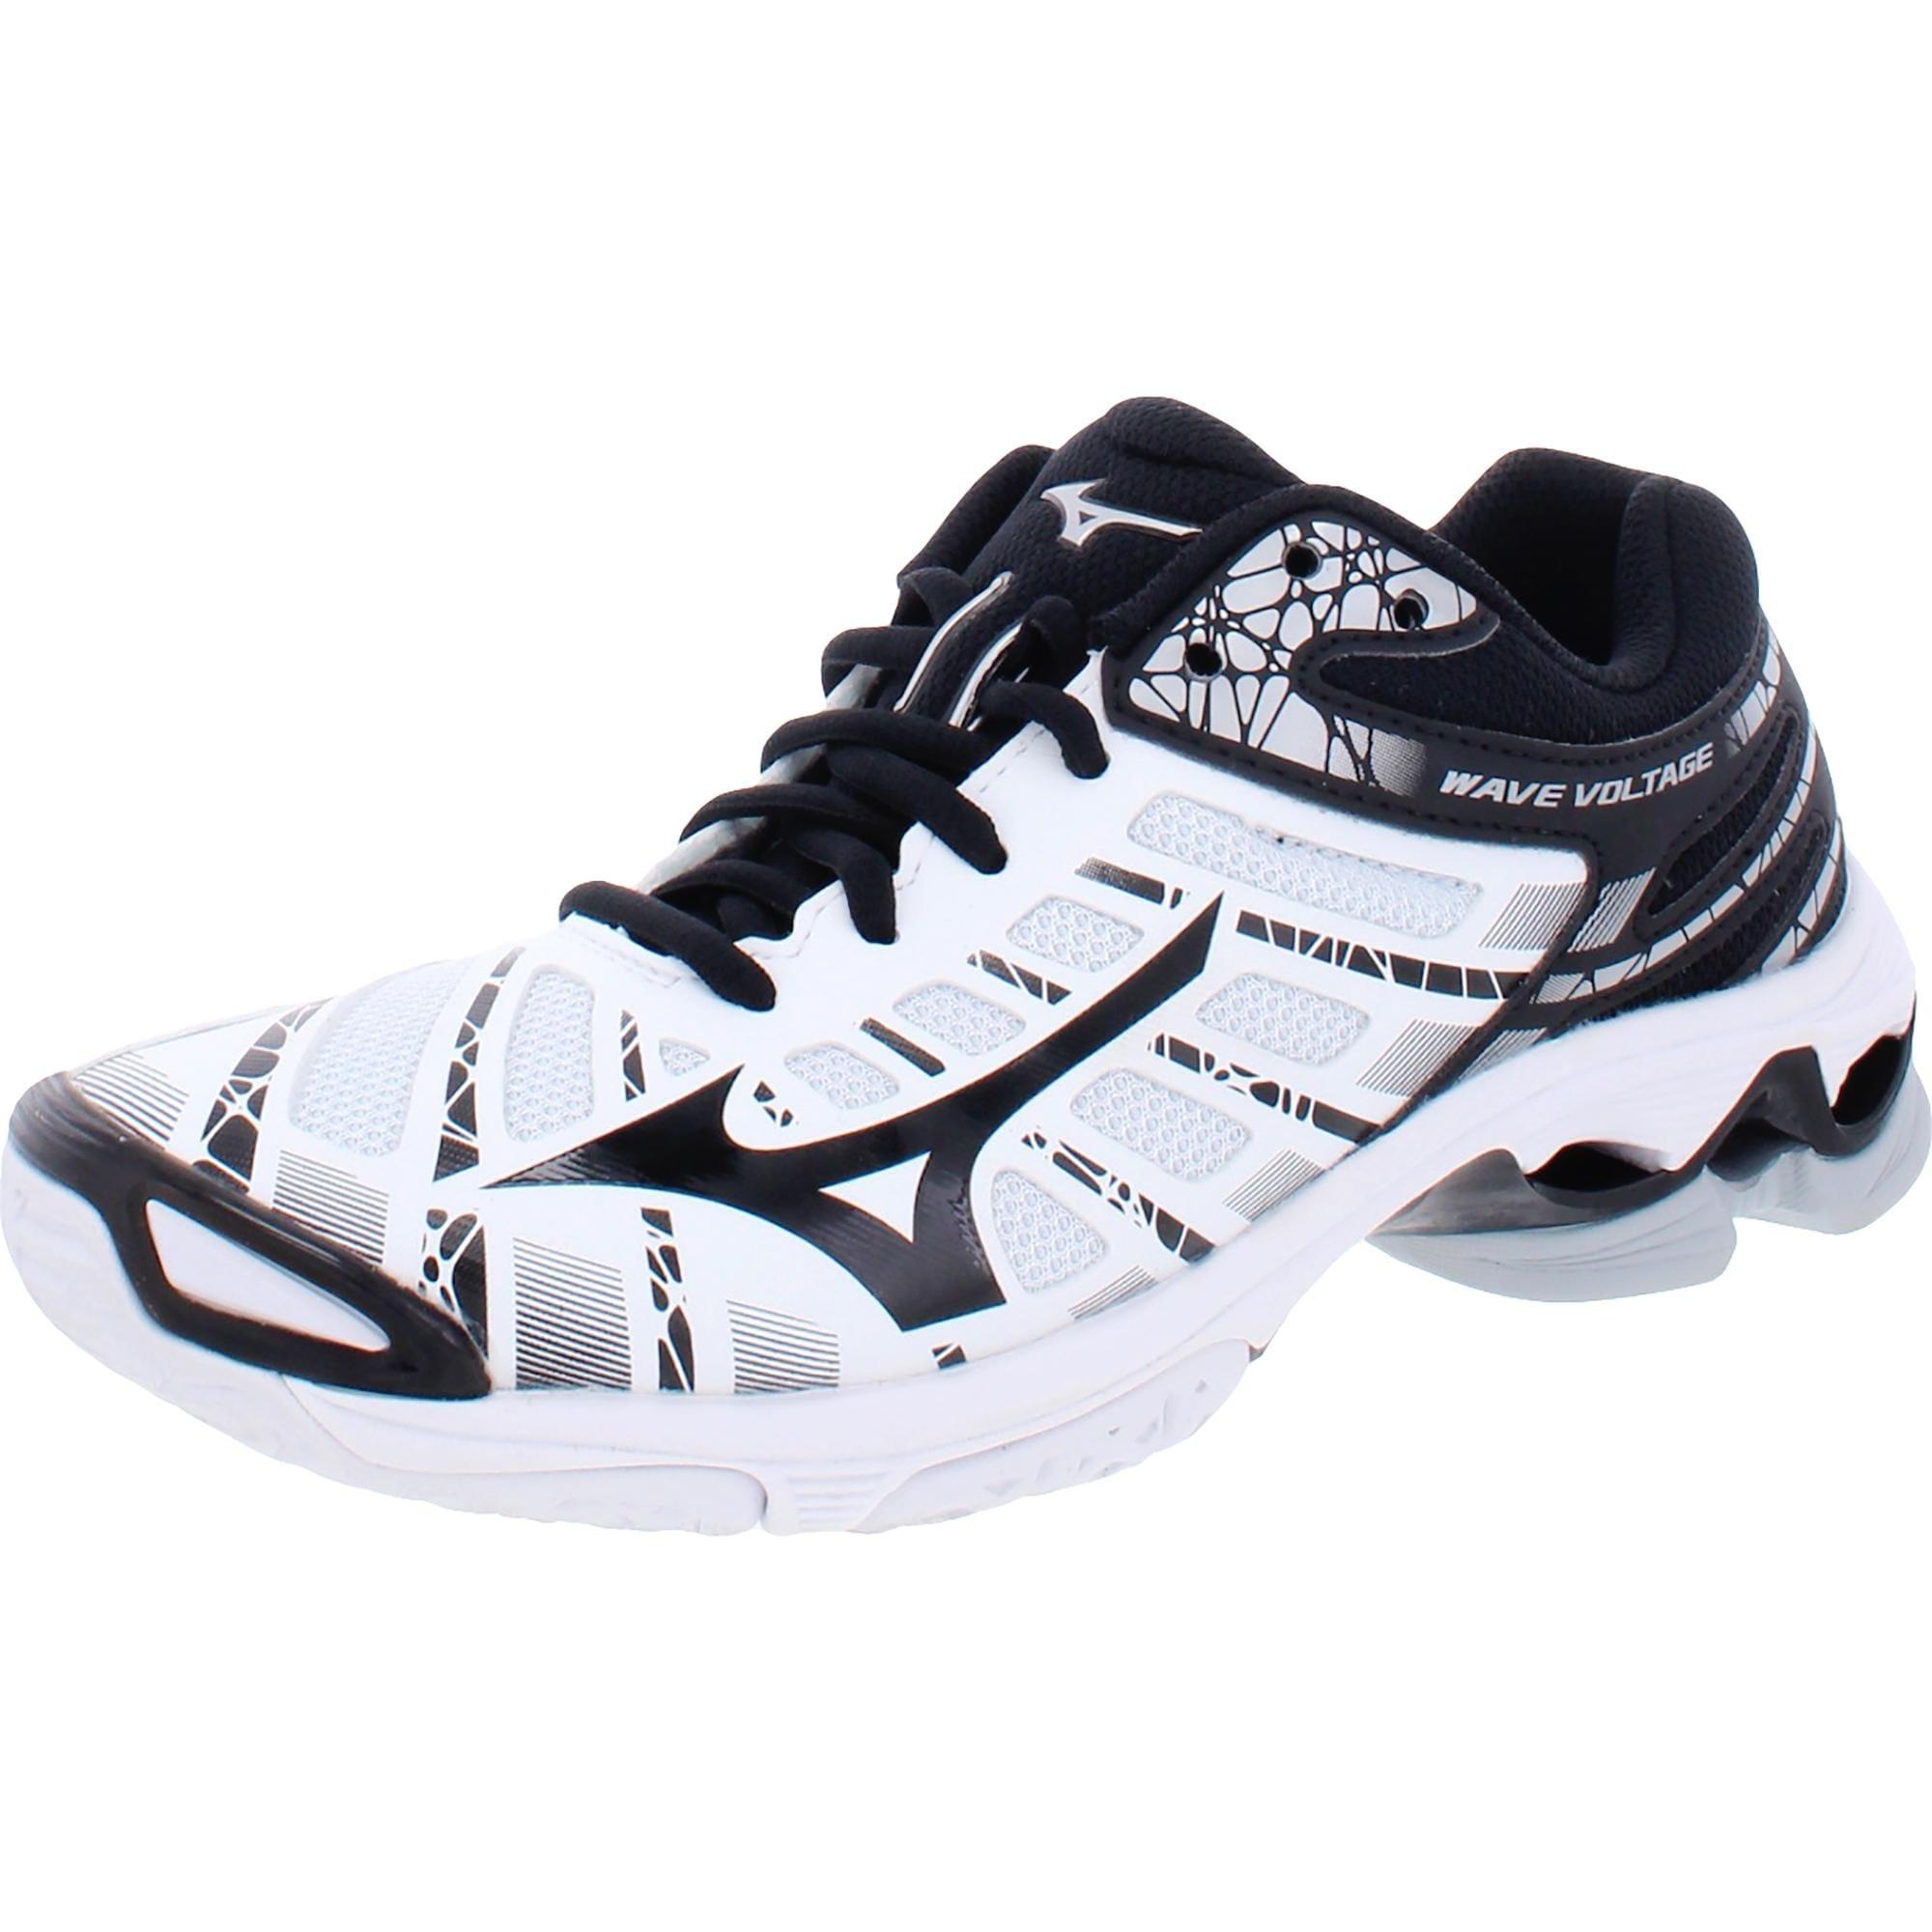 mizuno wave voltage volleyball shoes gold